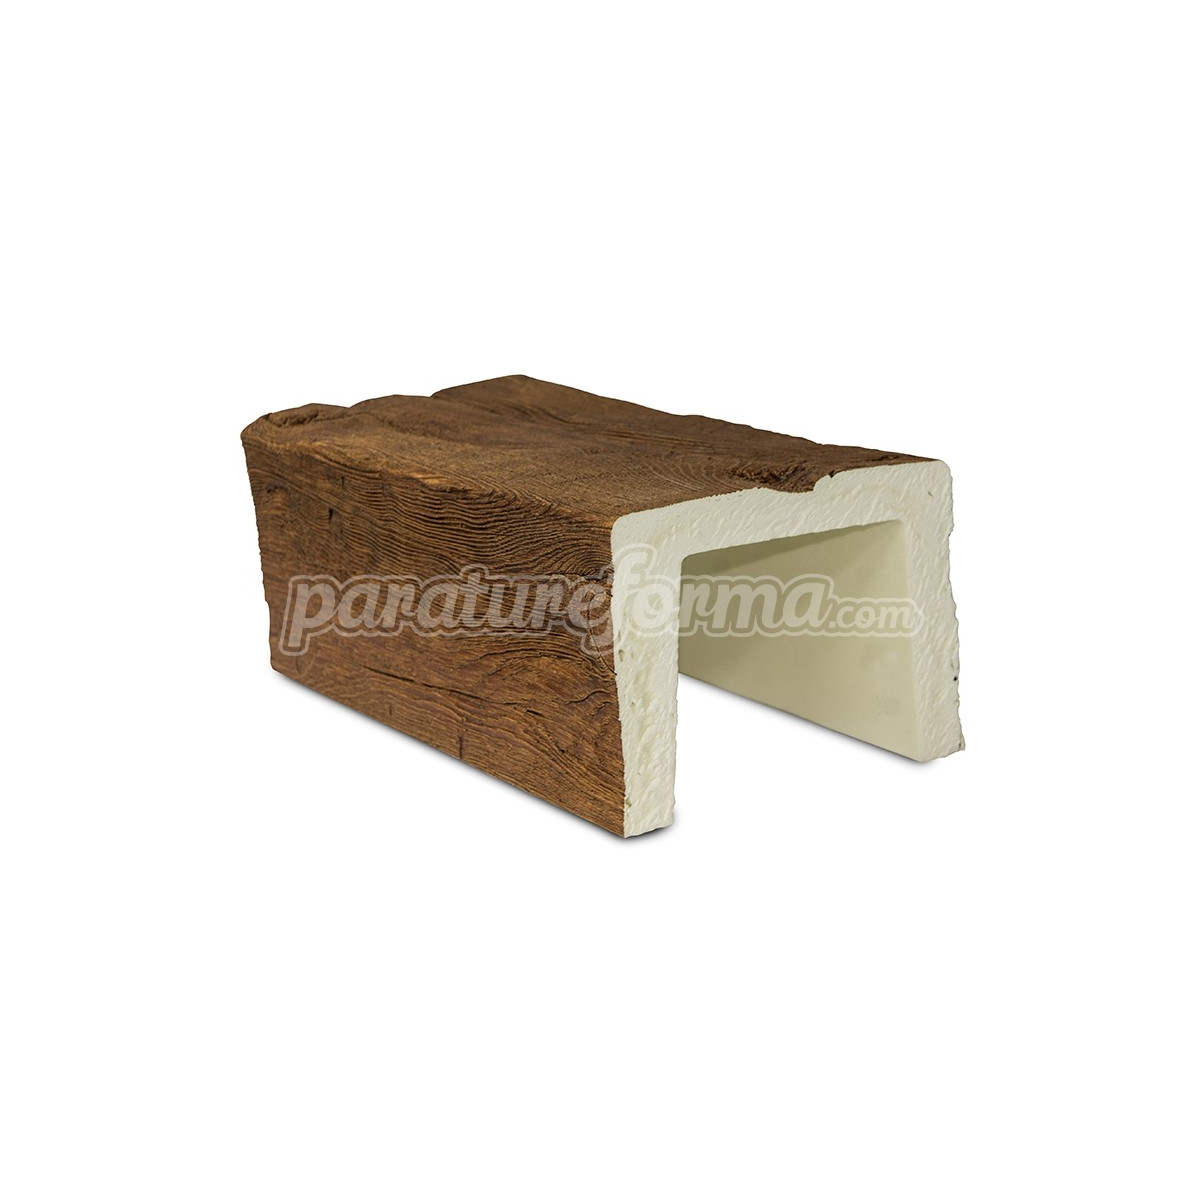 Viga imitación a madera 300x12,5x8 - Vigas imitación madera cuadradas